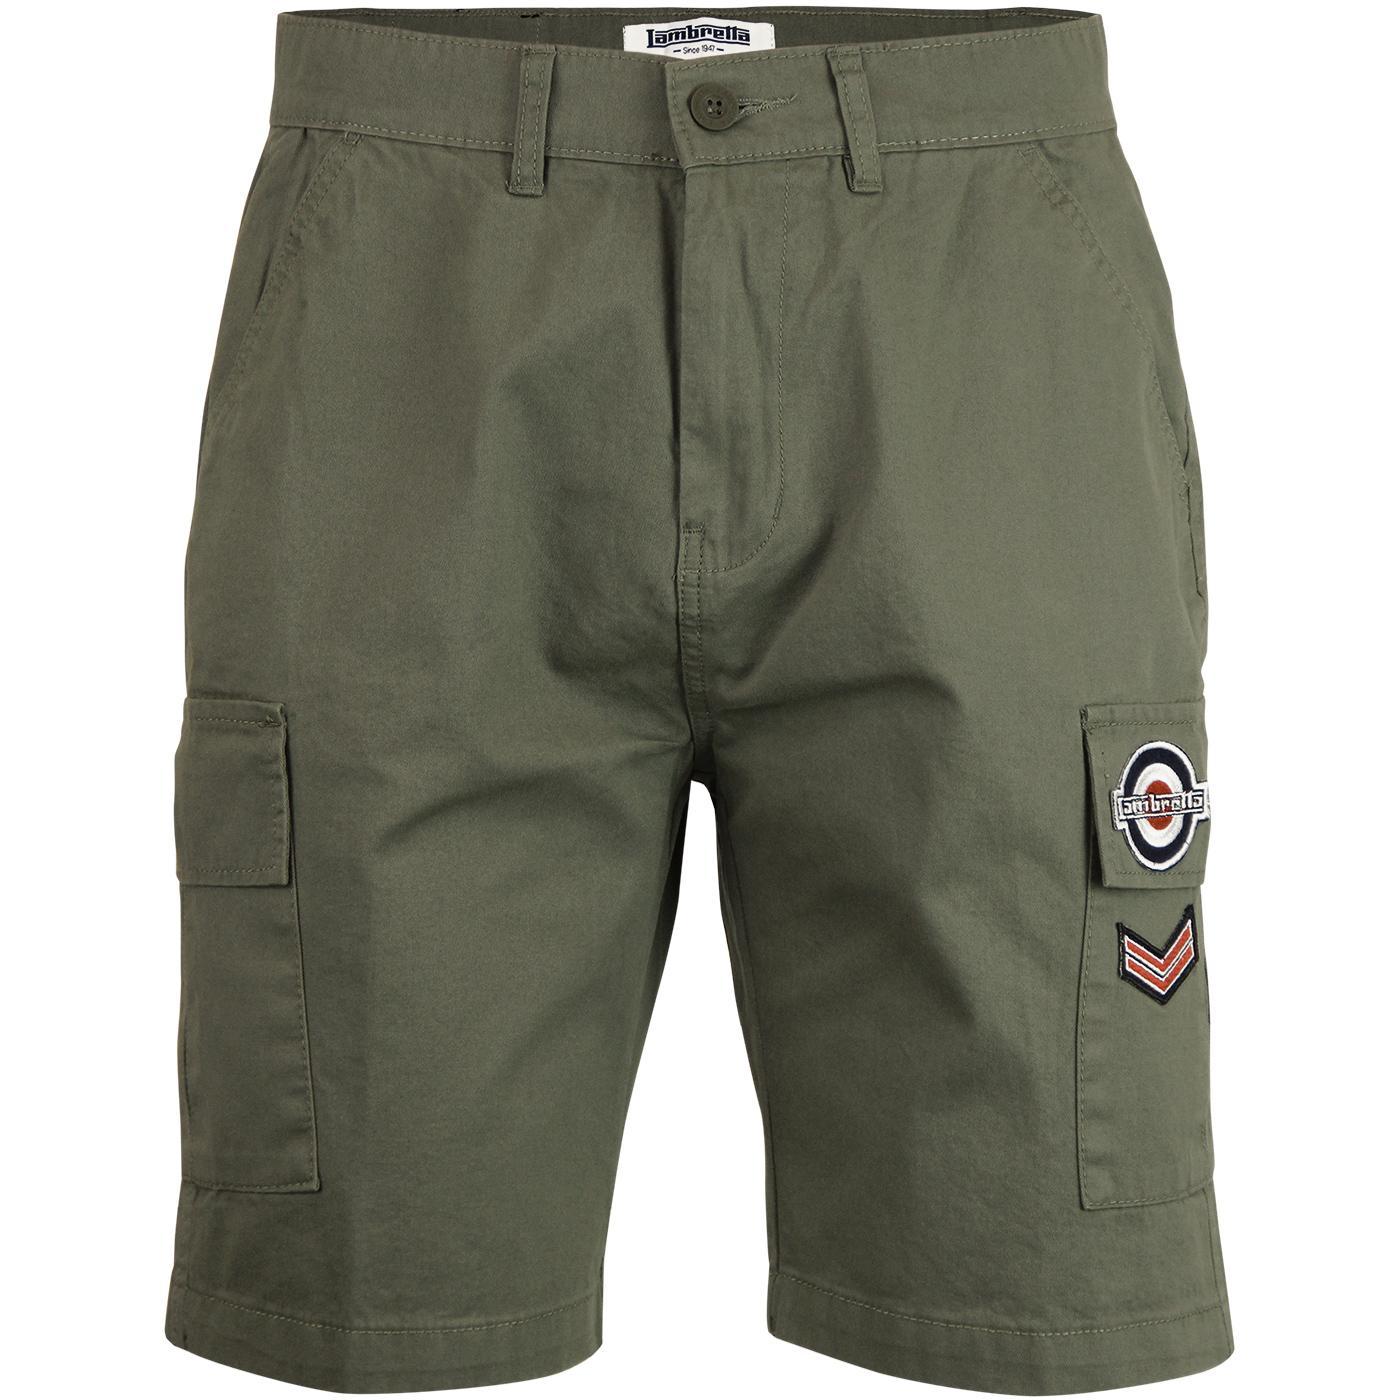 LAMBRETTA Men's Retro Mod Military Cargo Shorts K